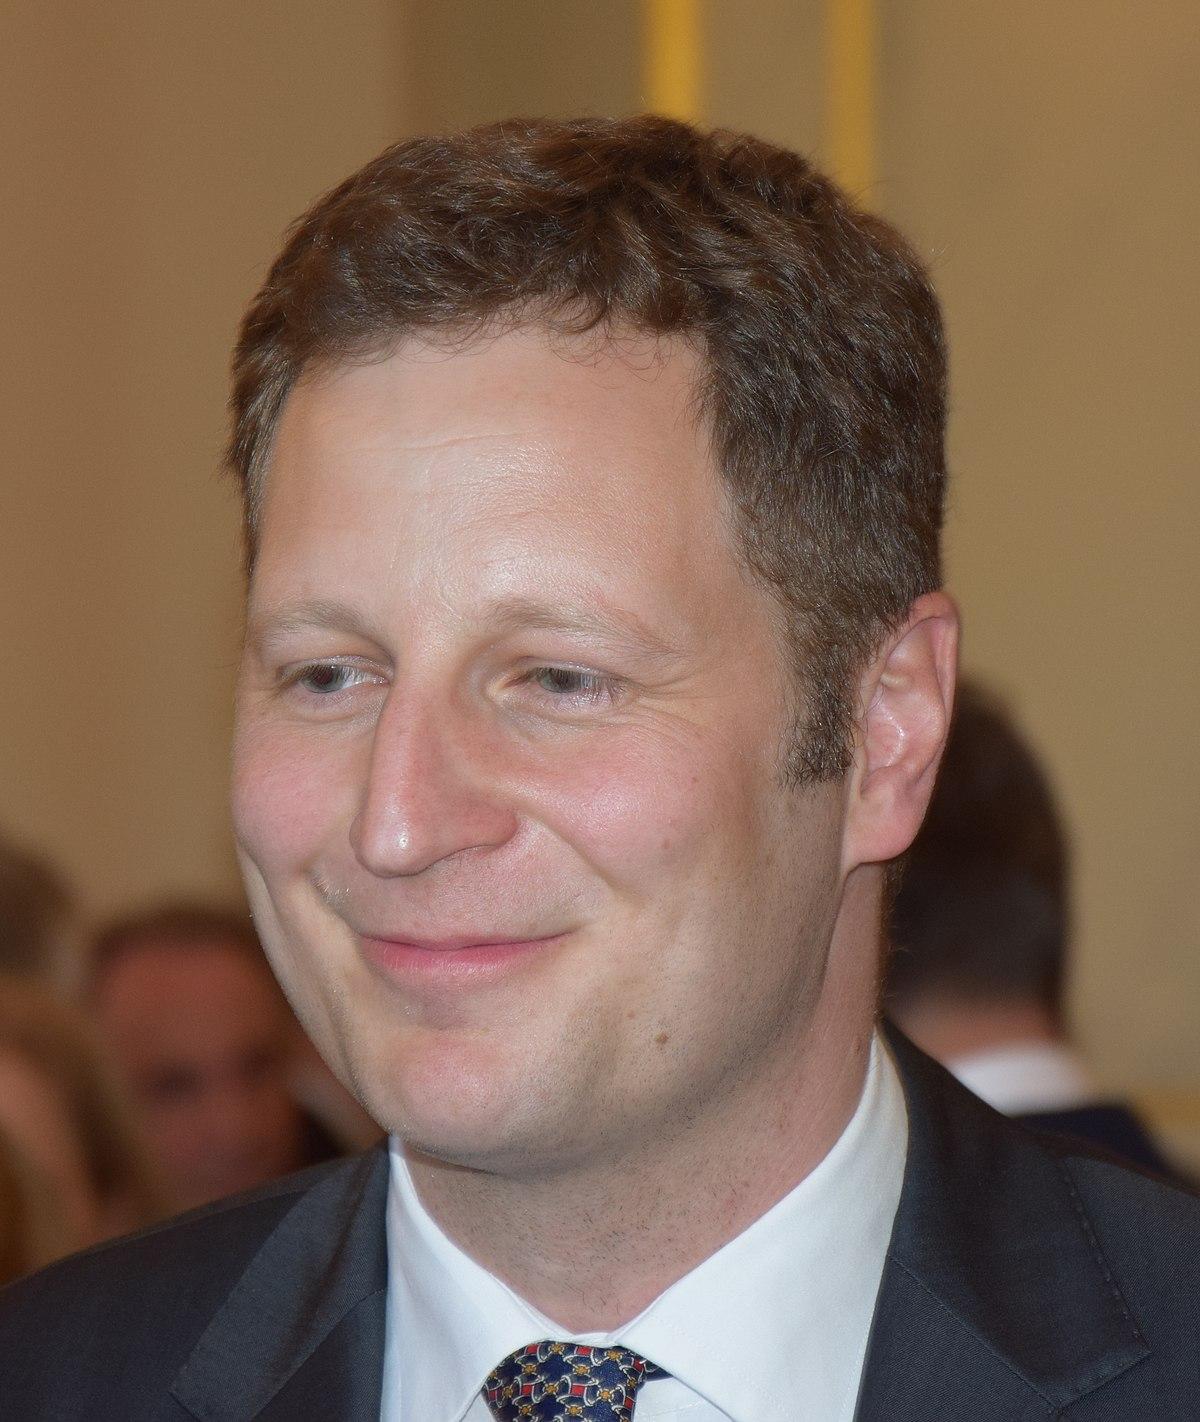 Friedrich Georg